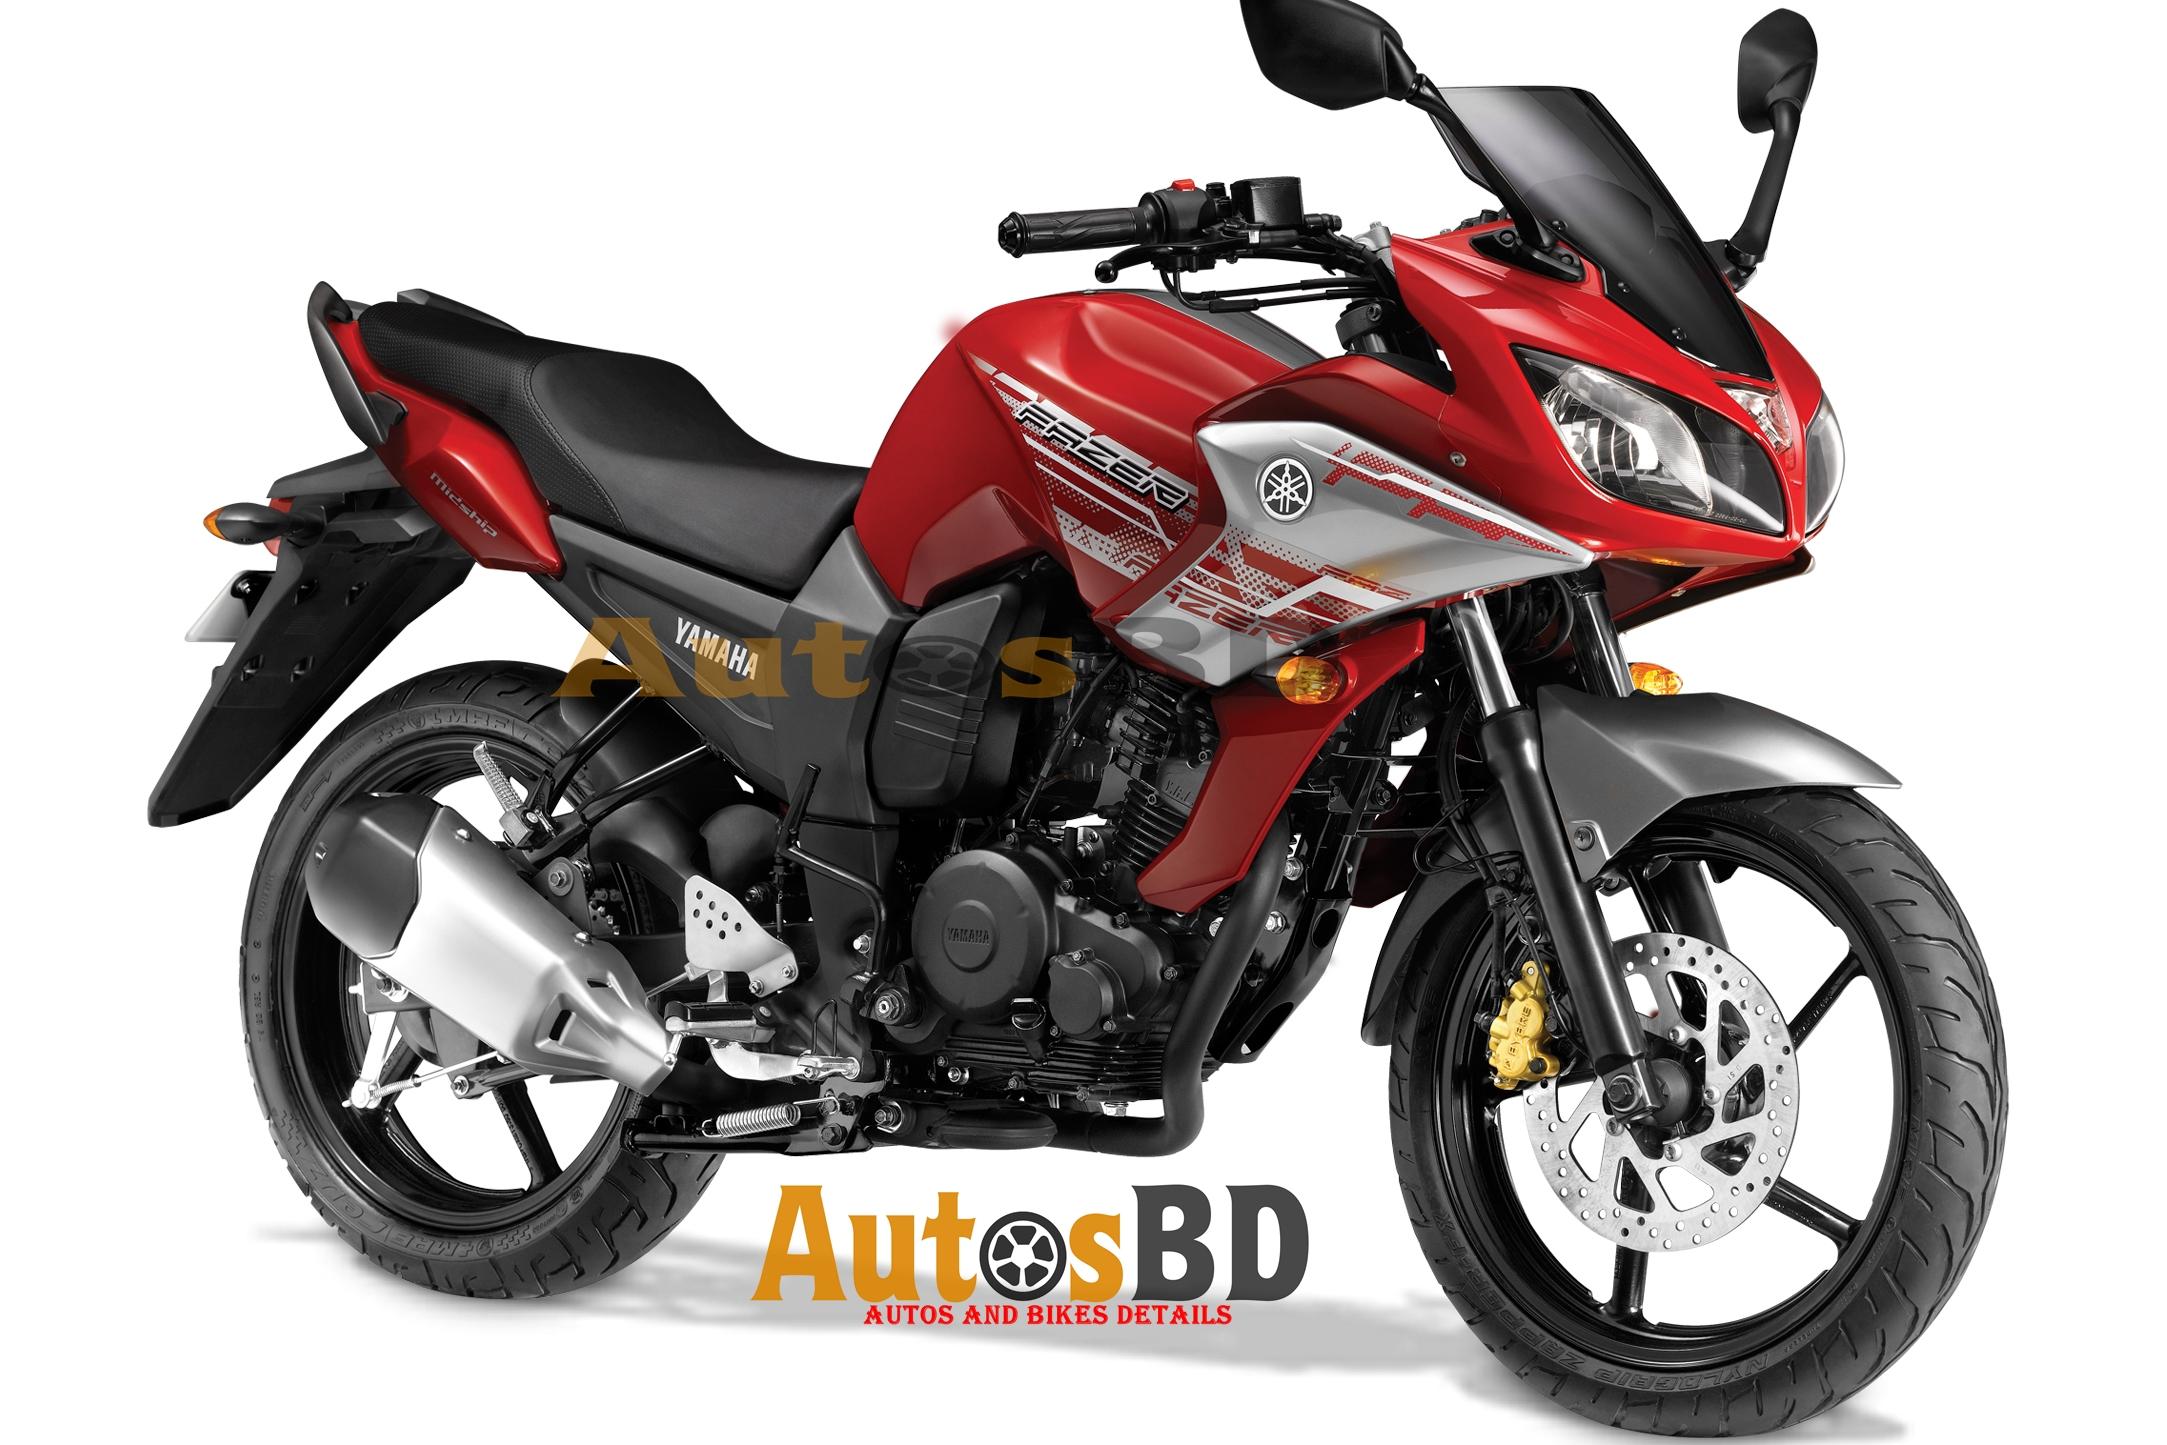 Yamaha FAZER Motorcycle Specification